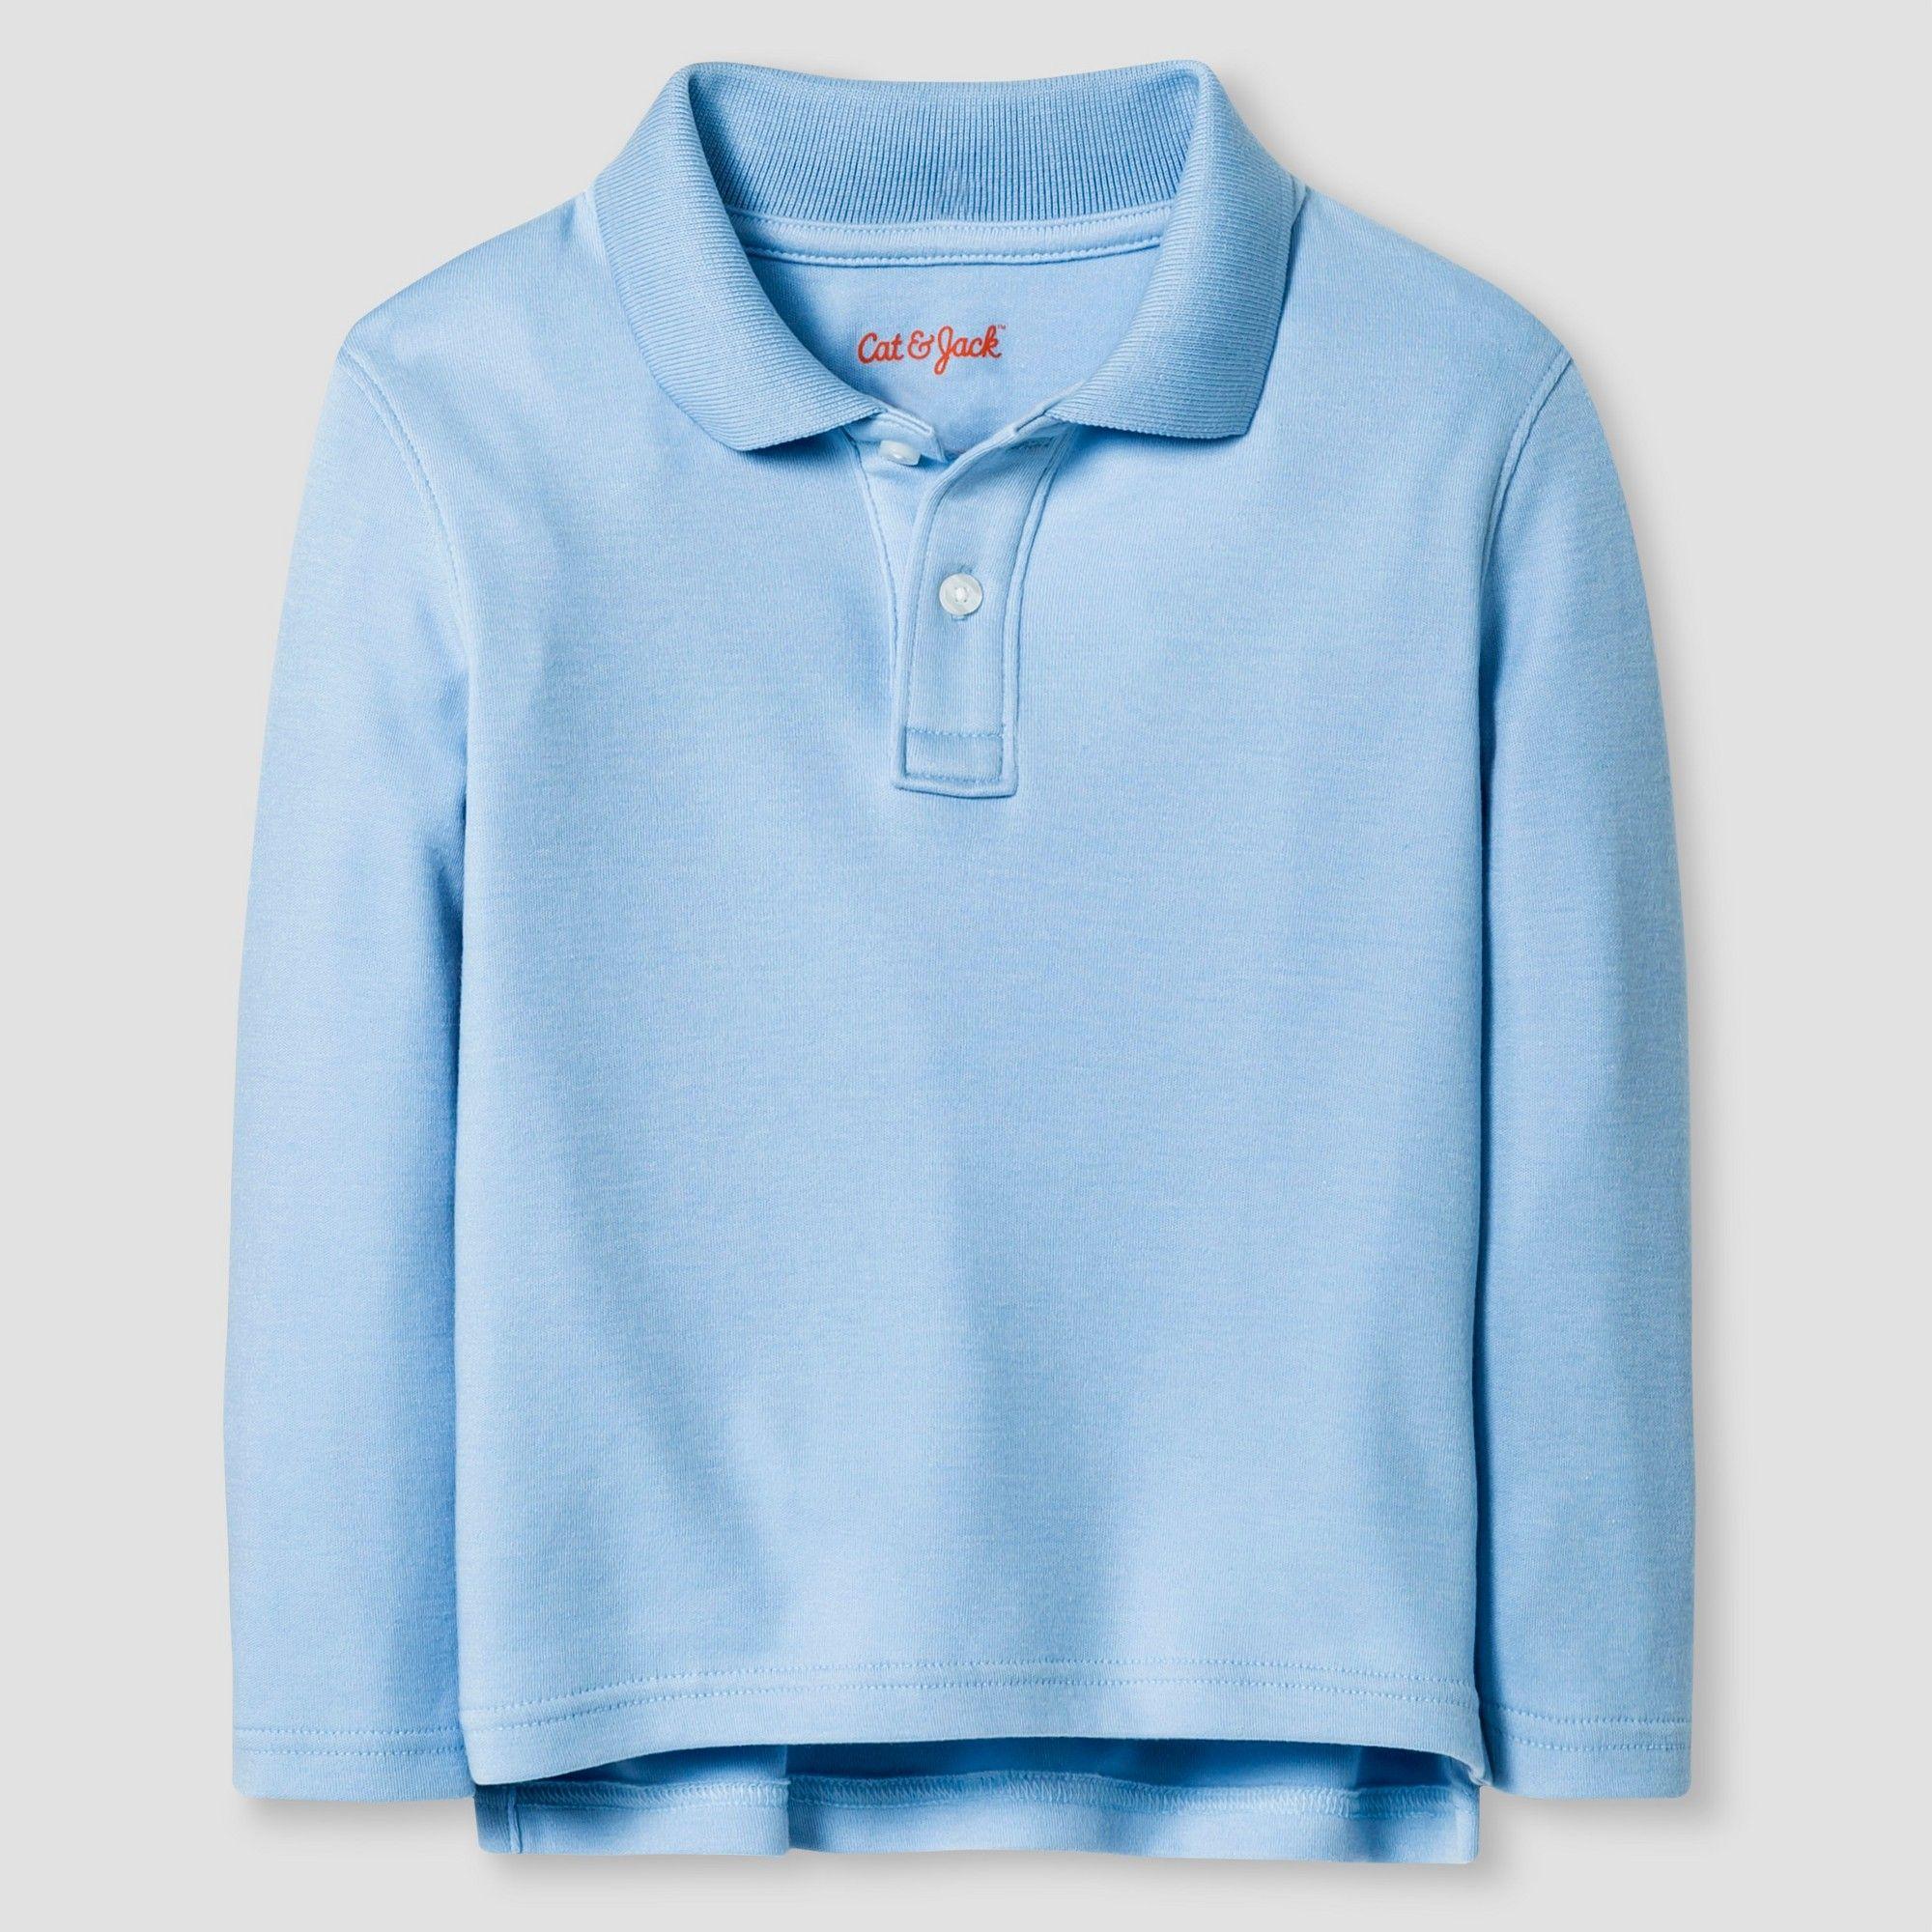 2cbd2822 Toddler Boys' Long Sleeve Interlock Polo Shirt Cat & Jack Light Blue, Size:  3T